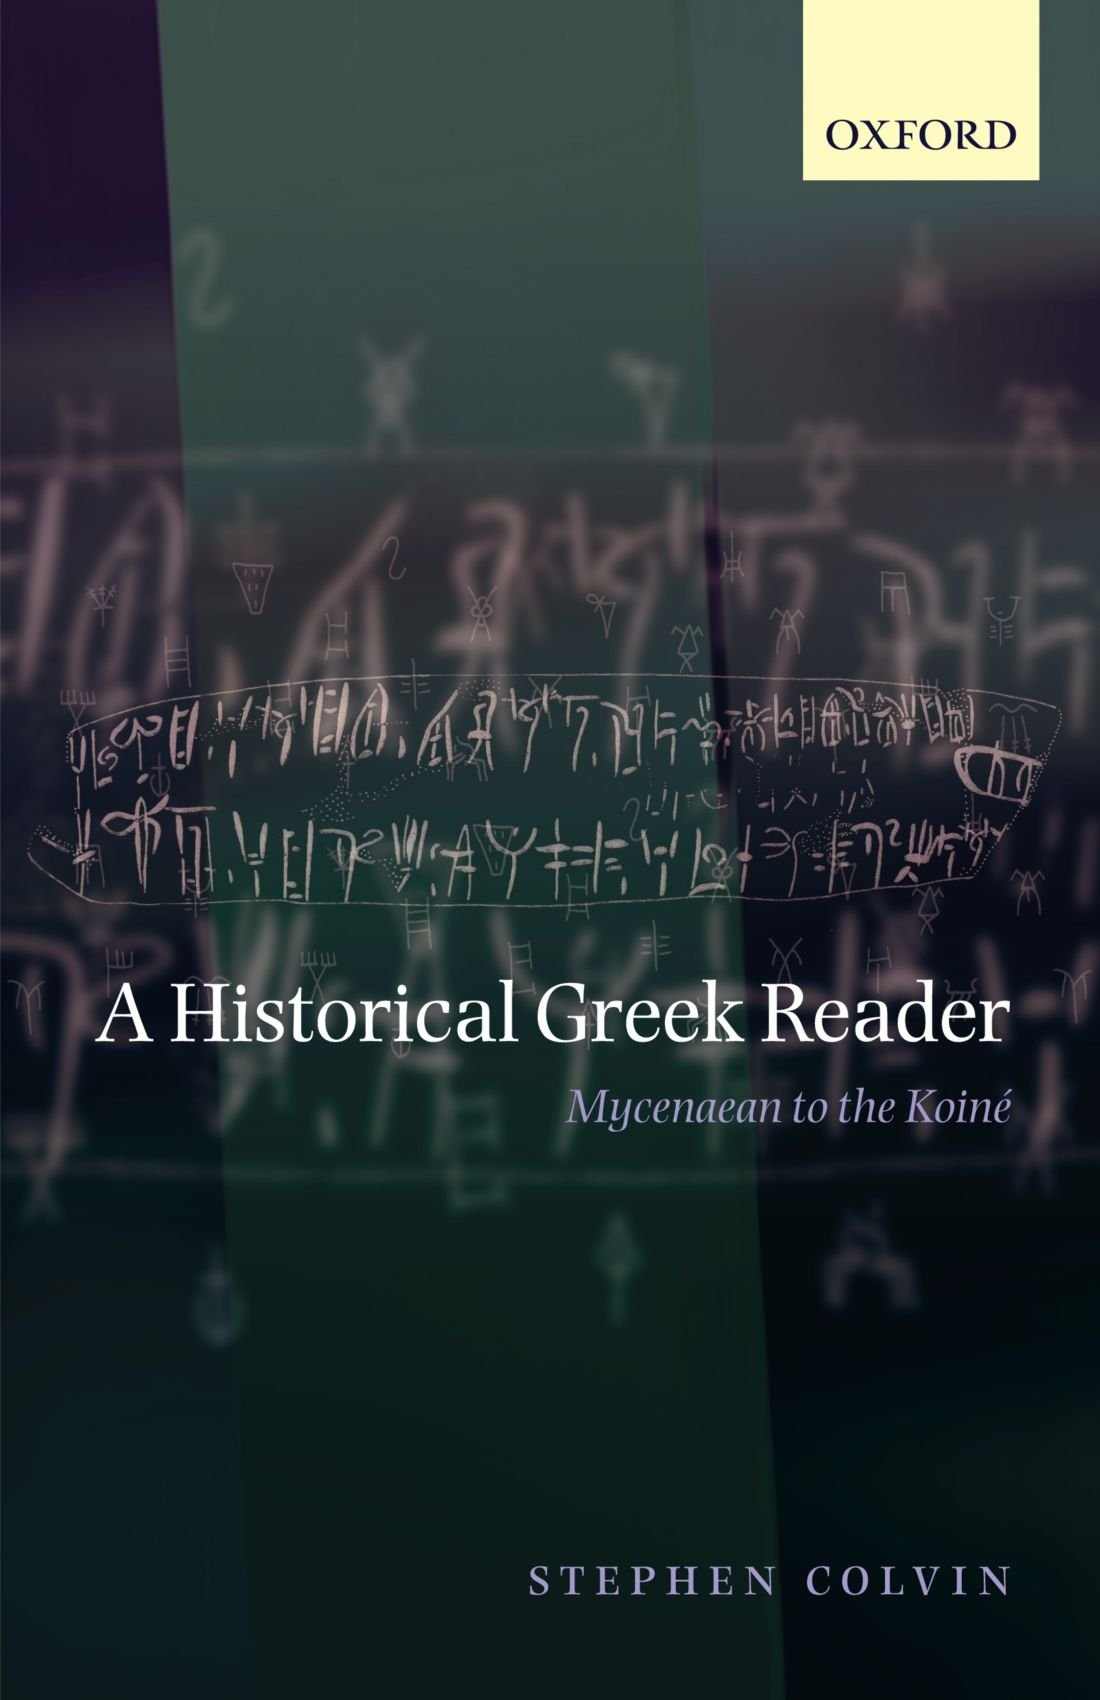 A Historical Greek Reader: Mycenaean to the Koine